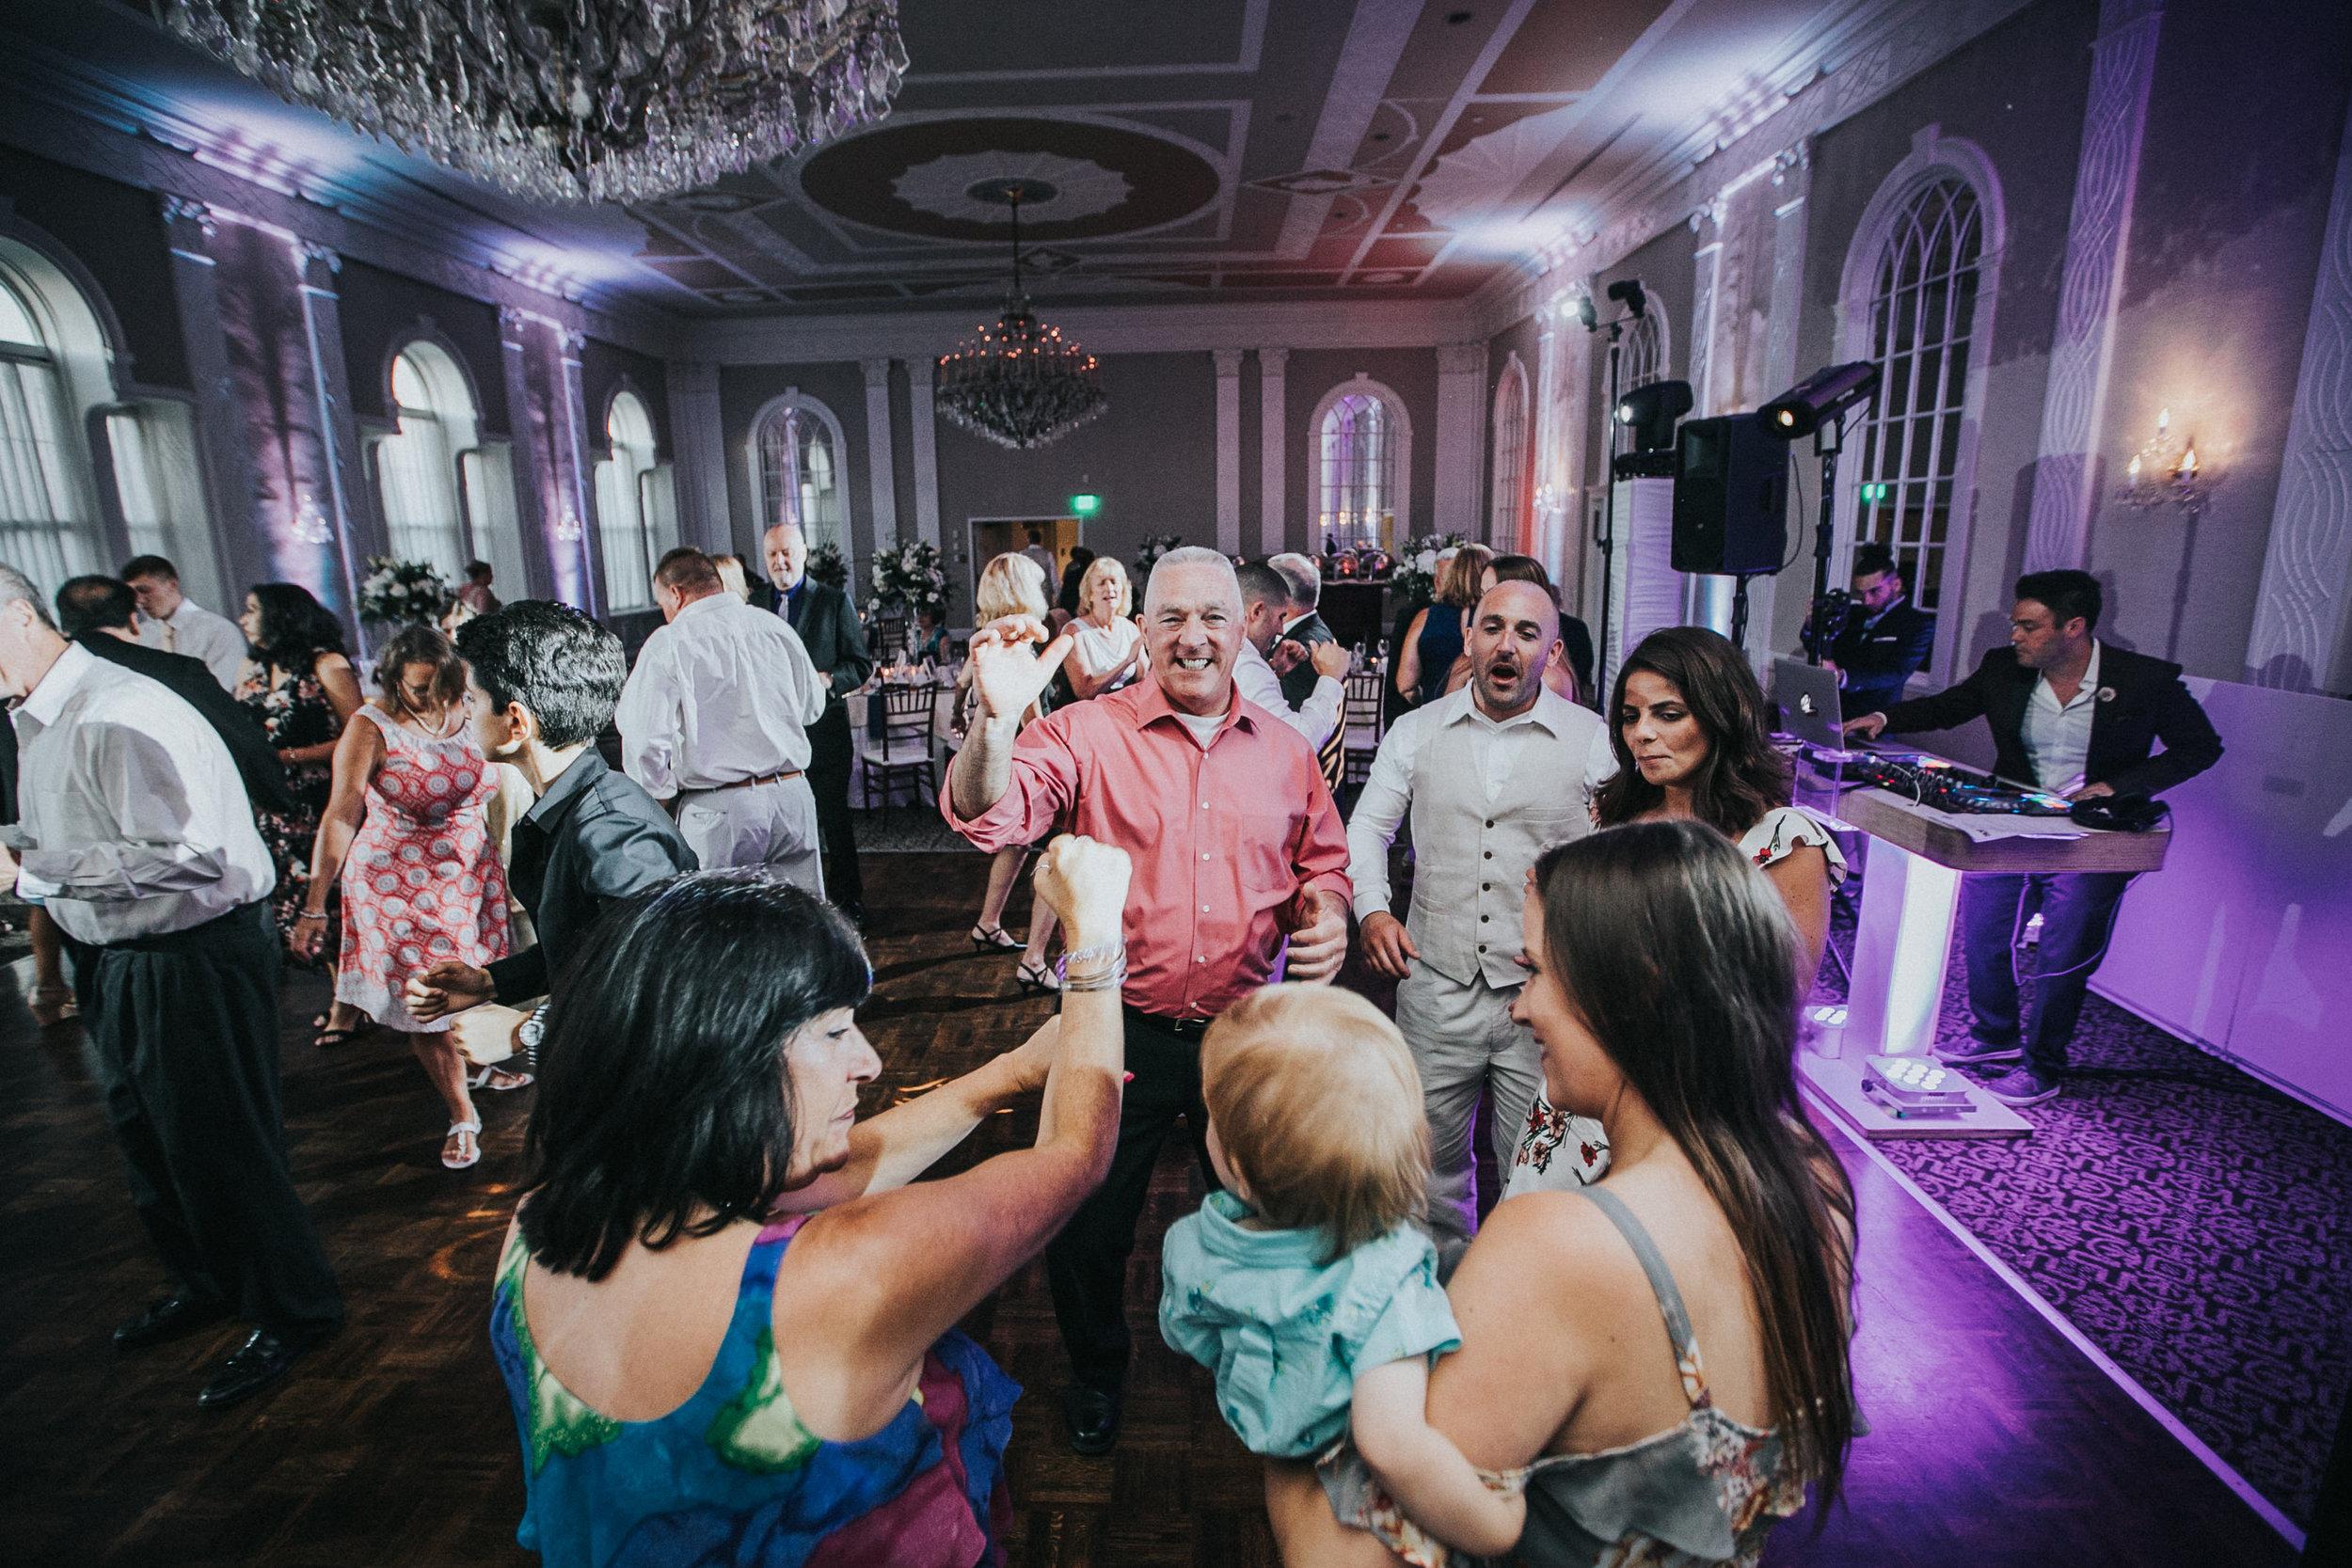 JennaLynnPhotography-NJWeddingPhotographer-Wedding-TheBerkeley-AsburyPark-Allison&Michael-Reception-115.jpg